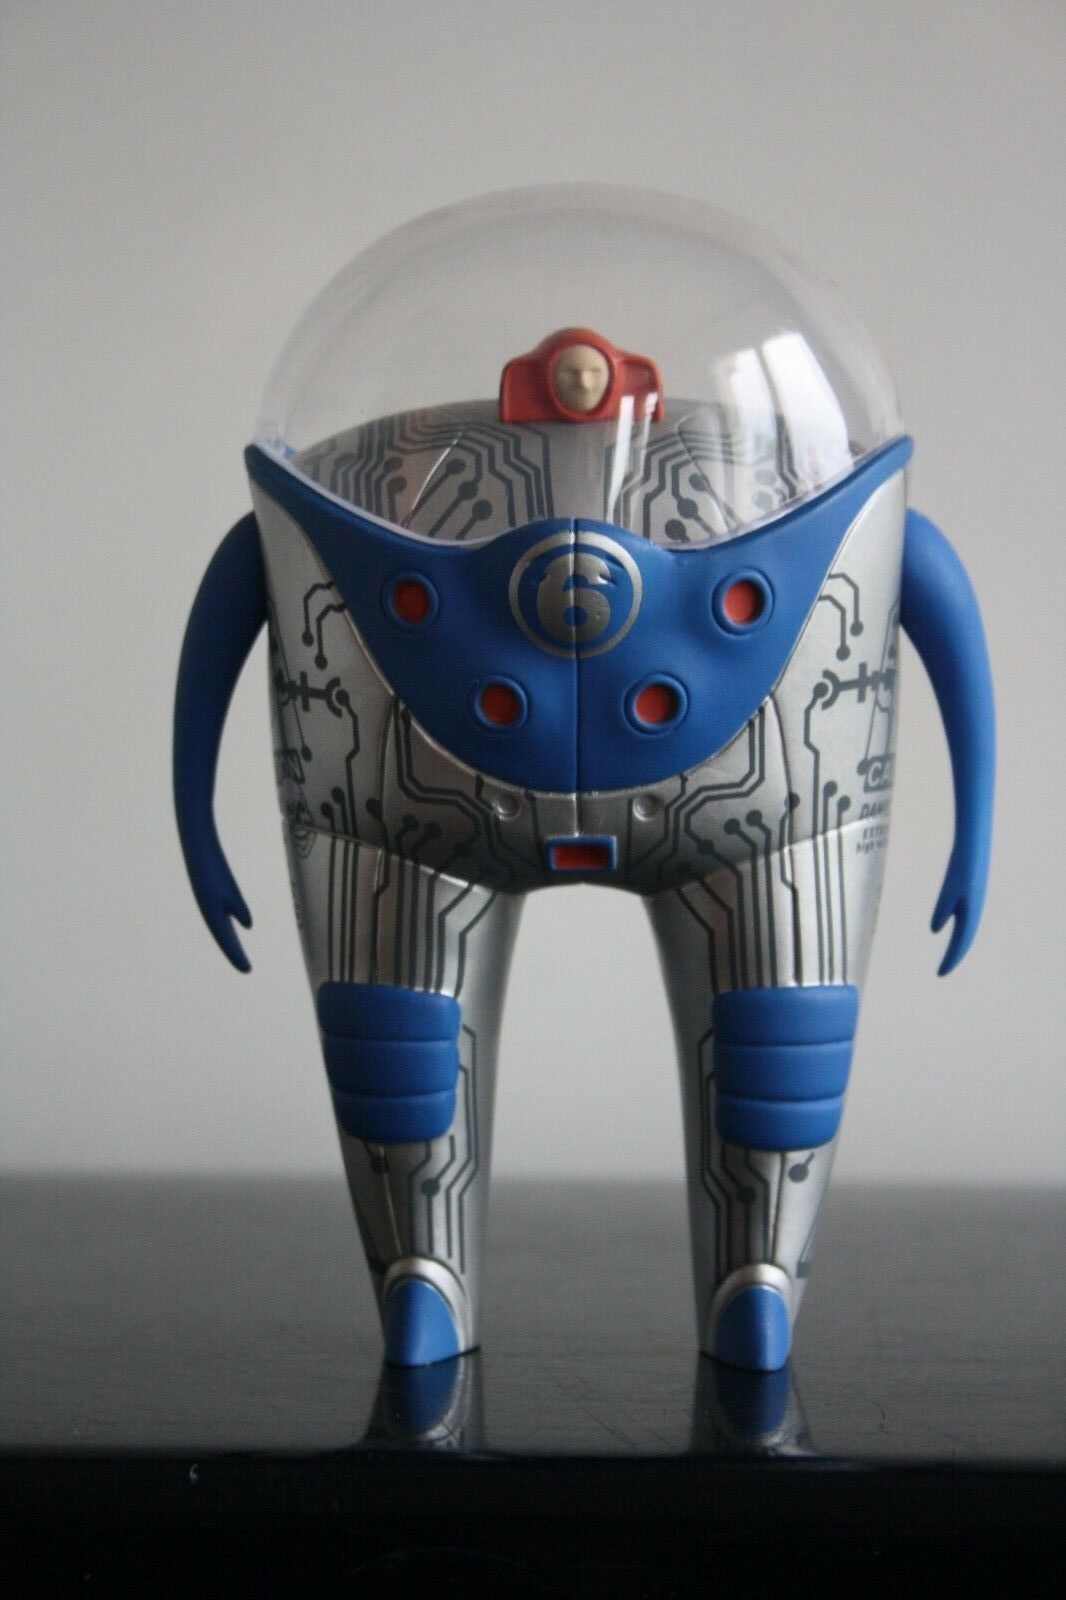 MARS-1  Berliner StrangeCo Desig Toy OBSERVER 8    PLANET 6 - blueE GREY Ed100 79f11e